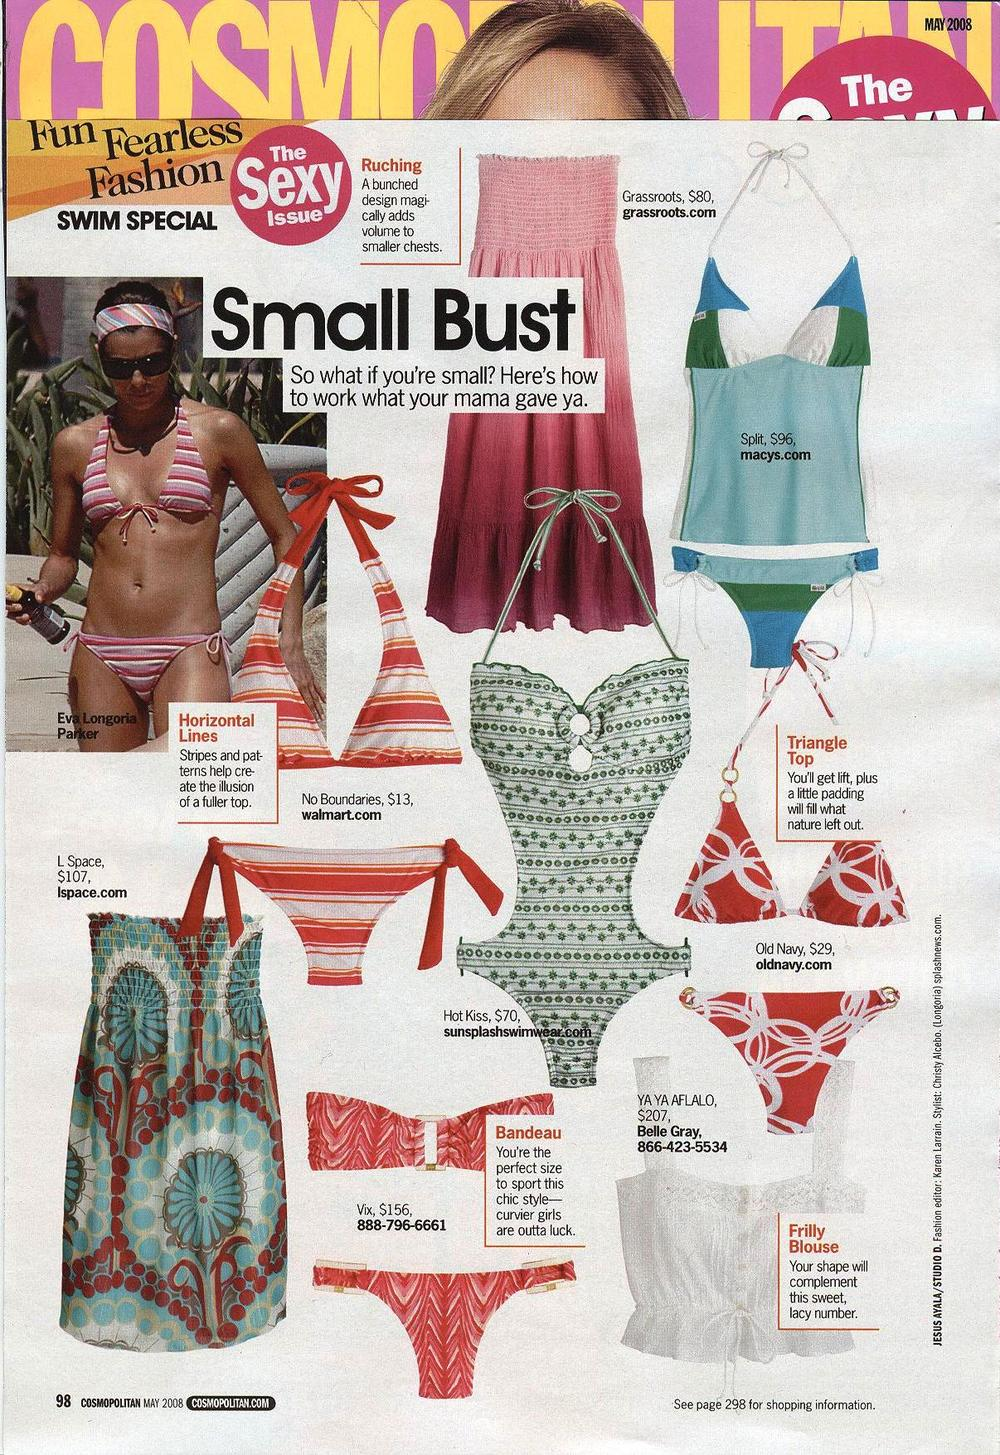 Cosmopolitan_May08_BabyDoll.jpg